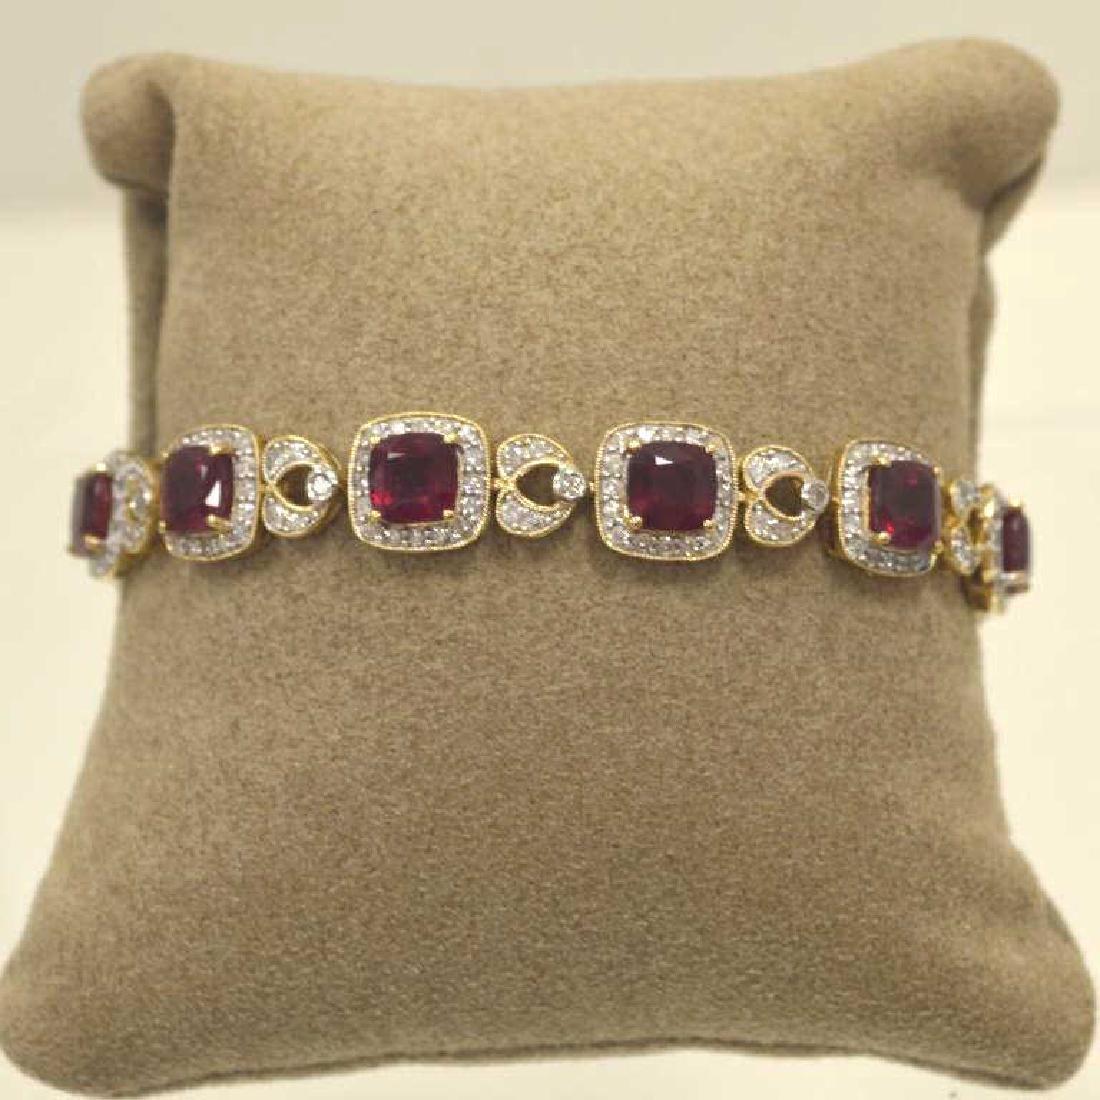 14kt yellow gold ruby and diamond bracelet